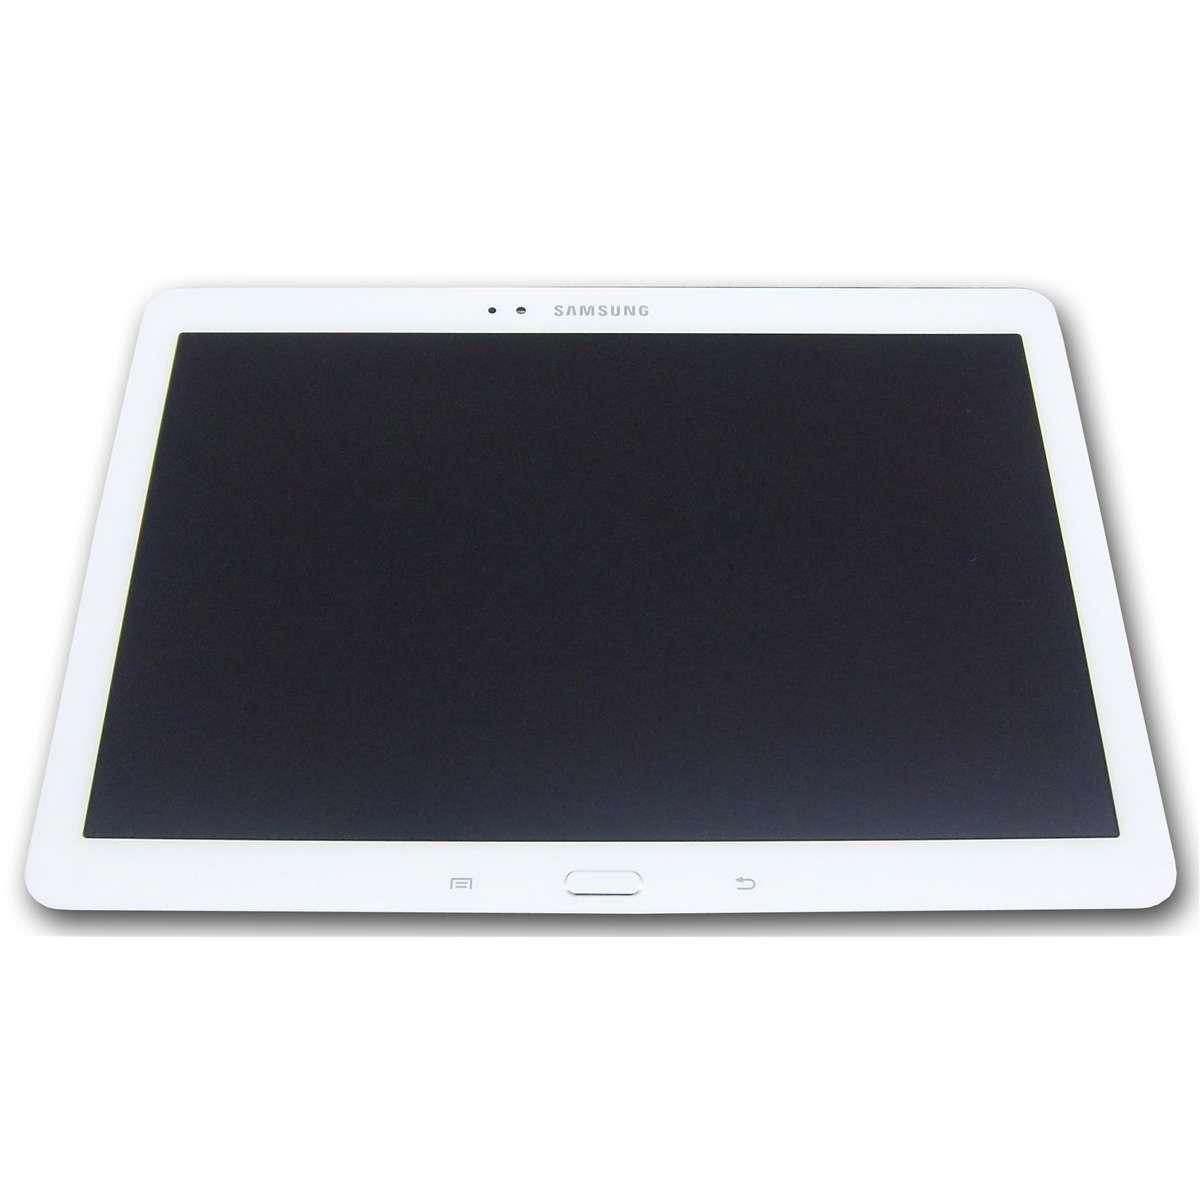 Ansamblu LCD Display Touchscreen Samsung P601 Galaxy Note 10.1 2014 3G Alb imagine powerlaptop.ro 2021